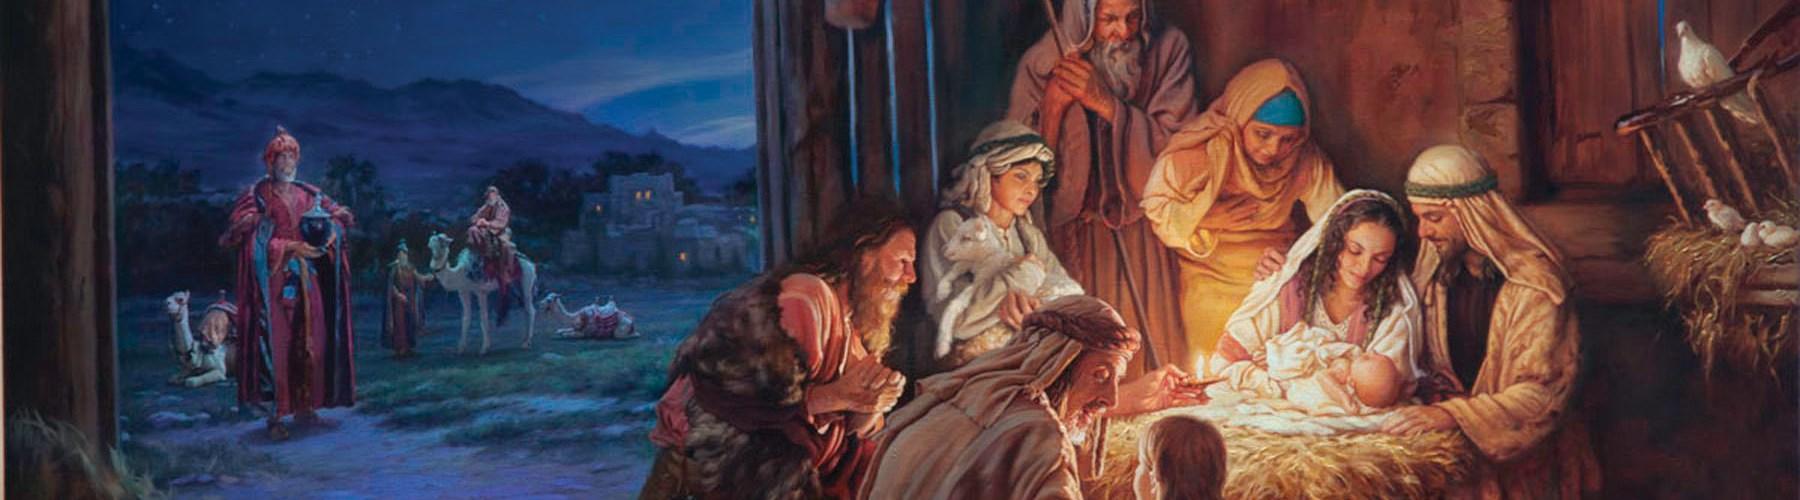 The Christmas Names Of Jesus Jesus Theologia Est Scientia Vivendo Deo